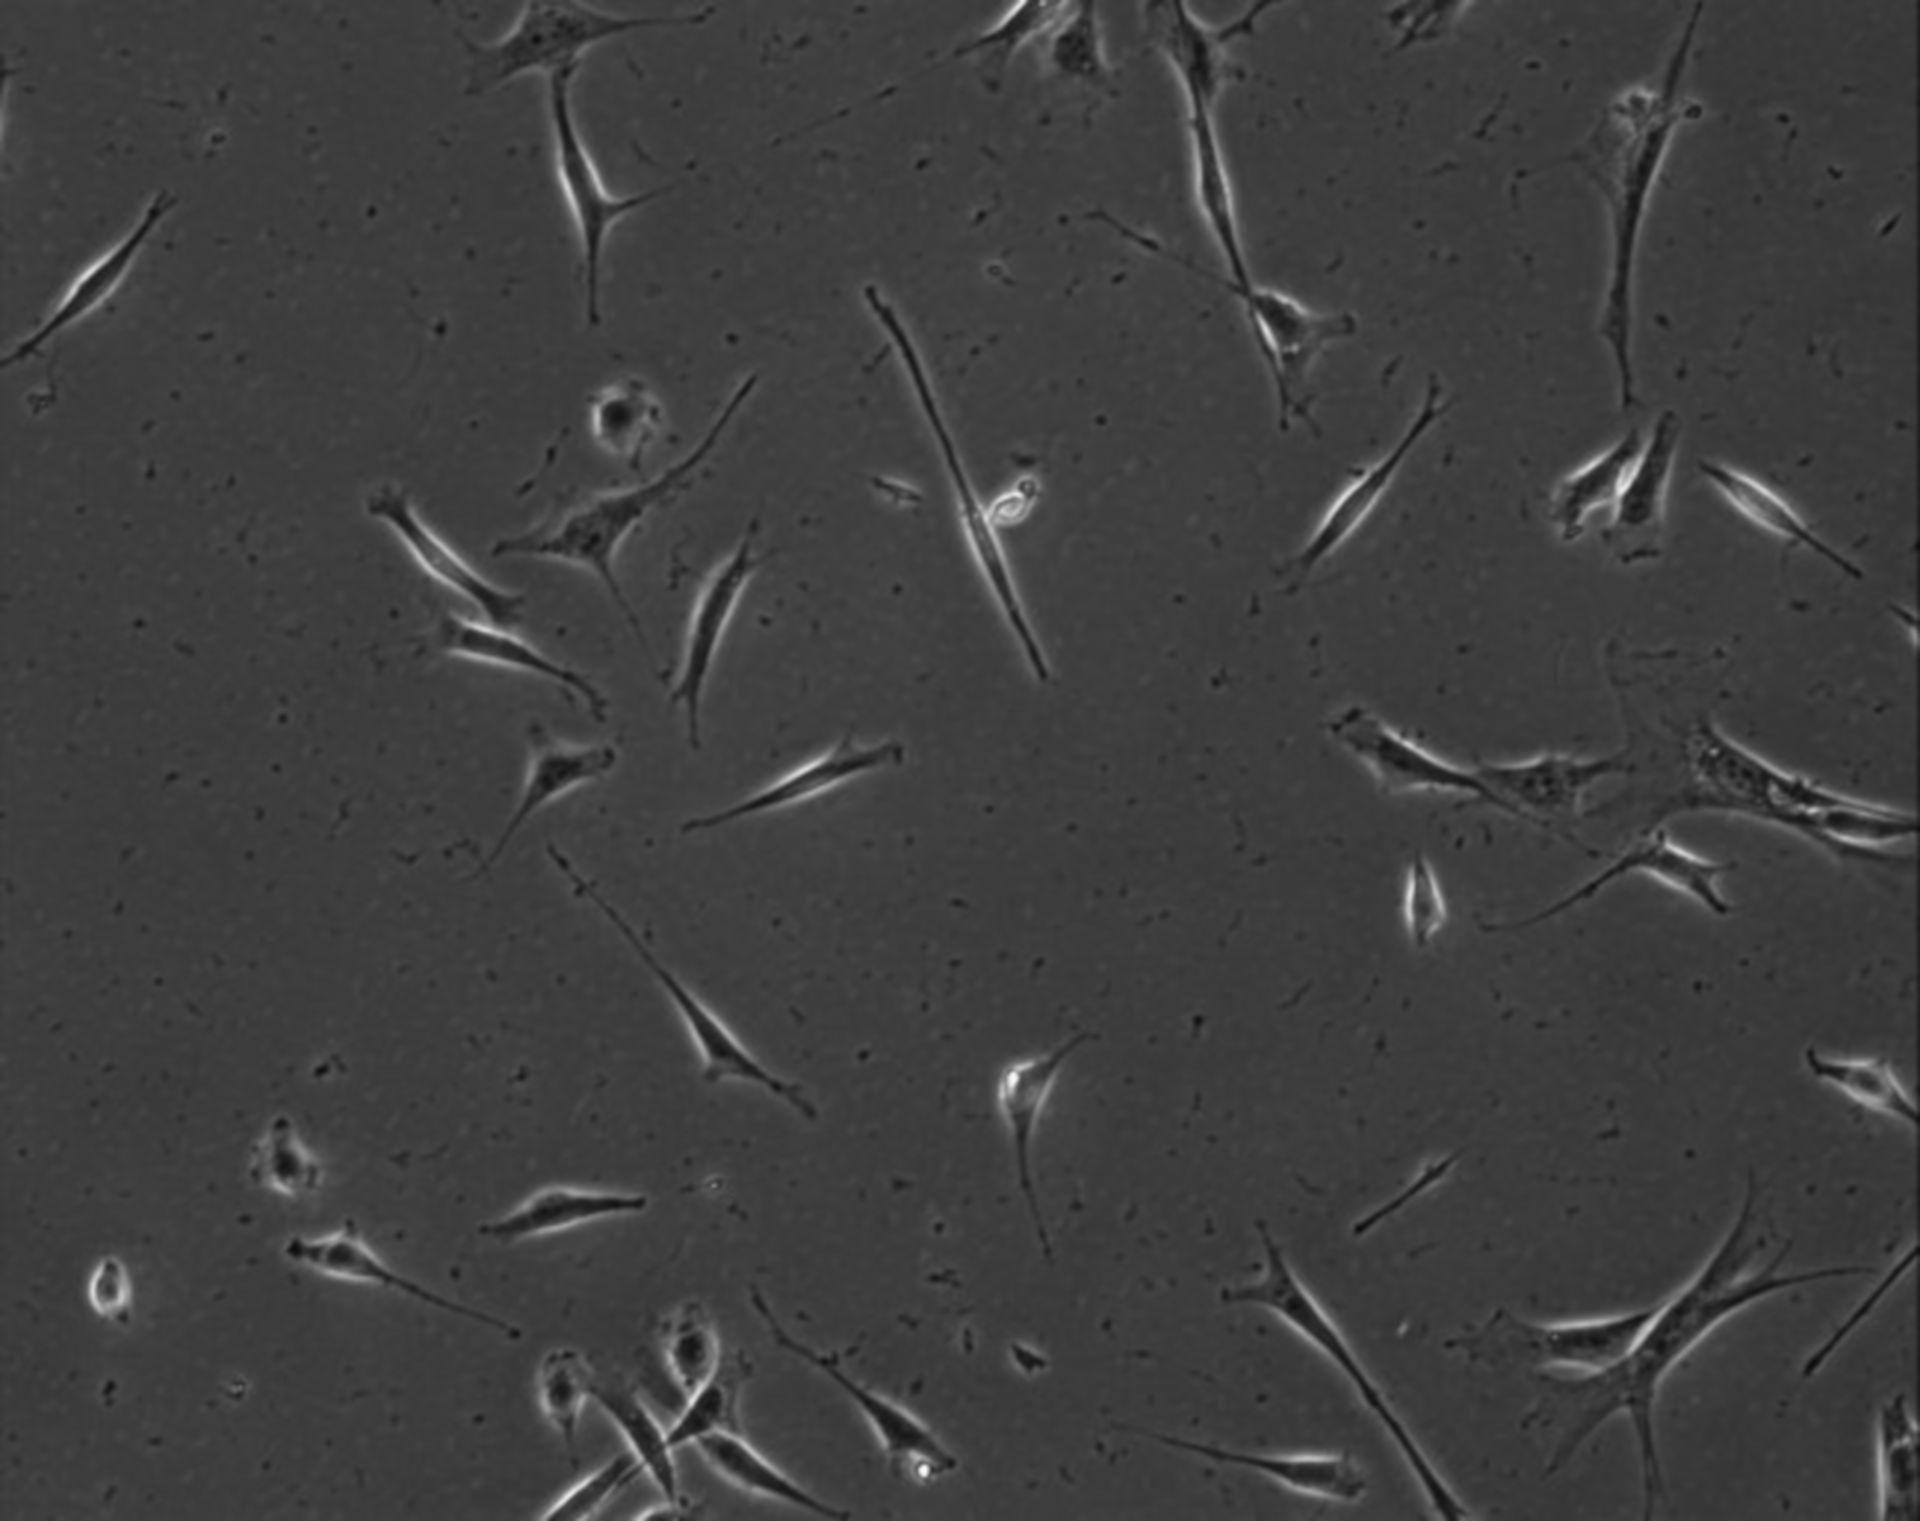 Mus musculus (Extracellular matrix part) - CIL:7898